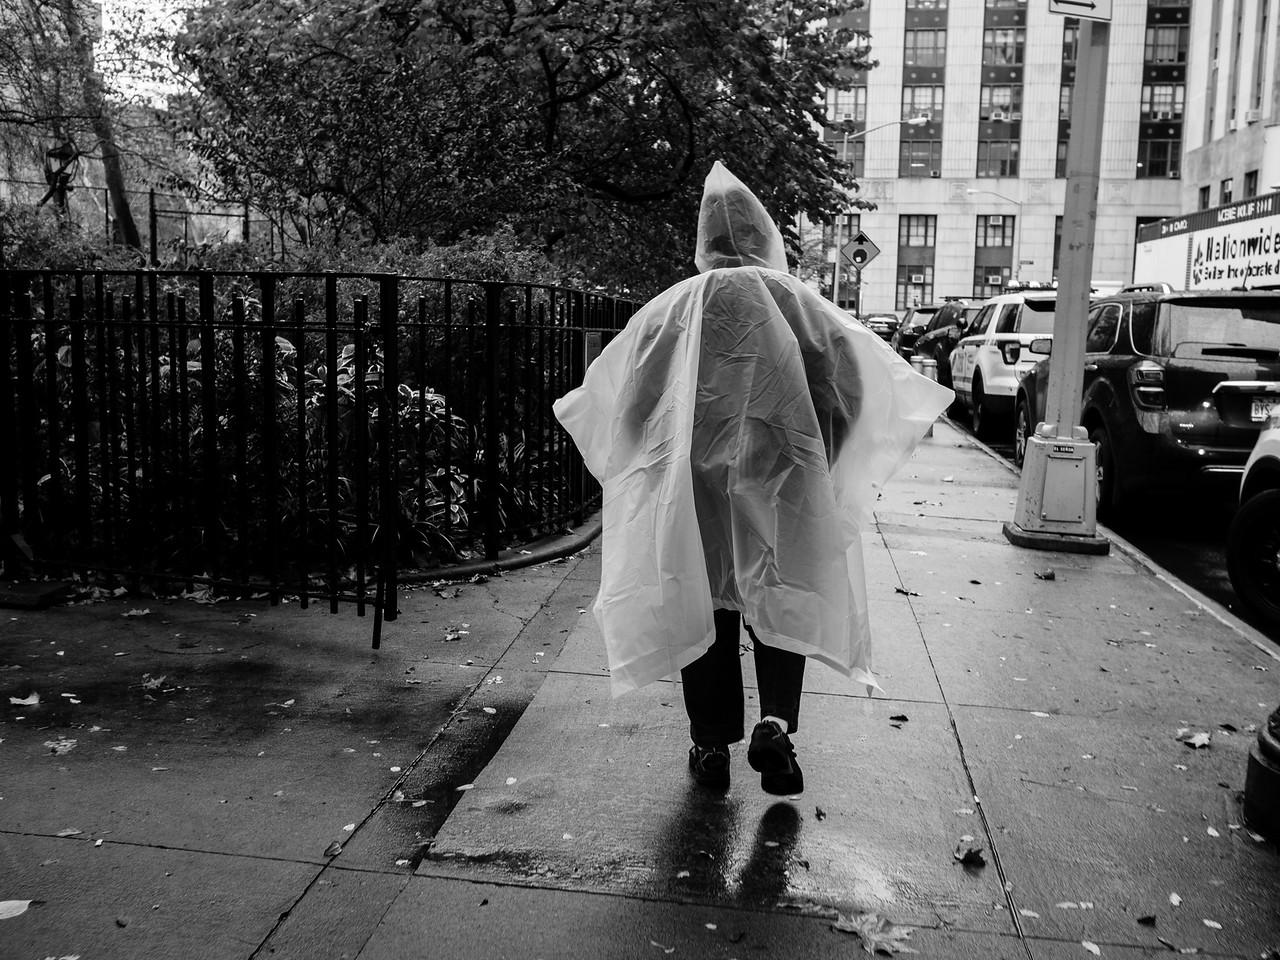 Rain wear in Chinatown.